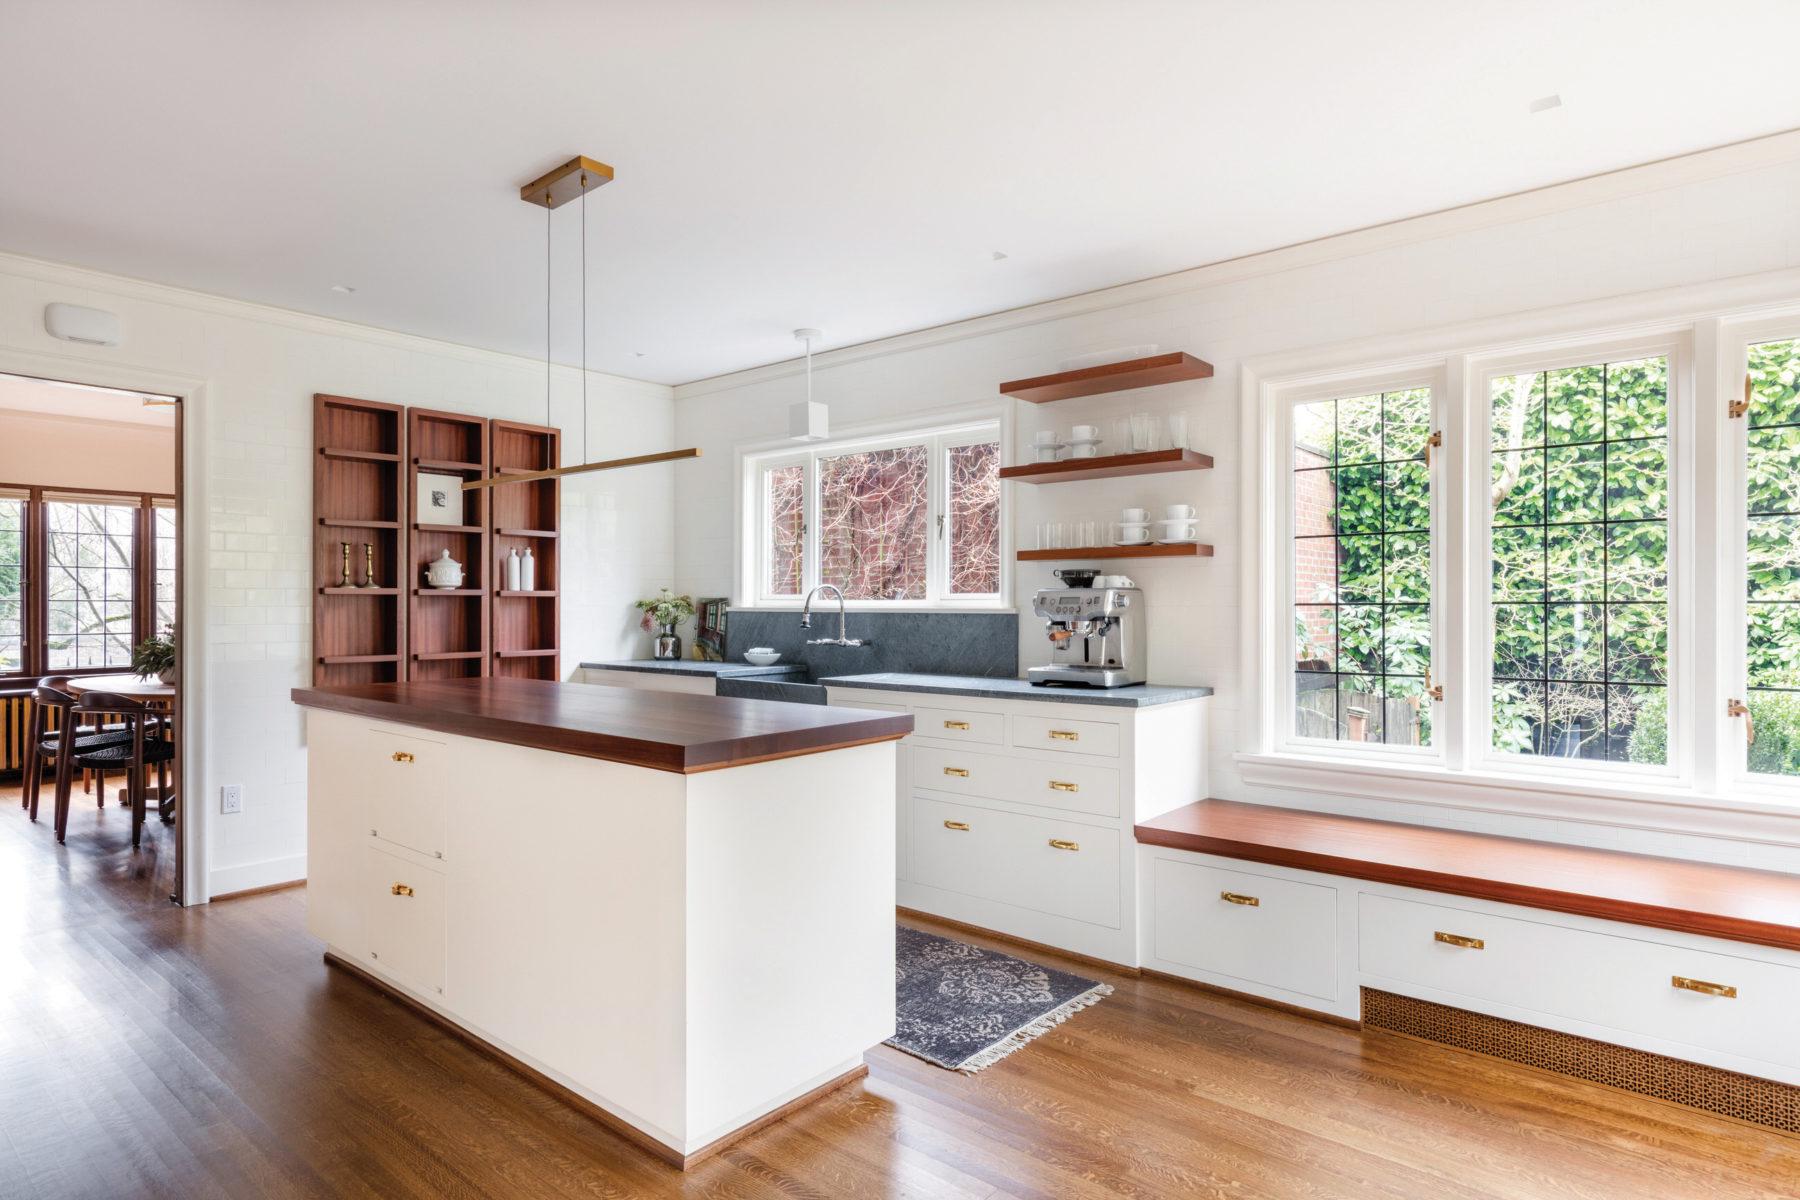 701-35th-kitchen-main